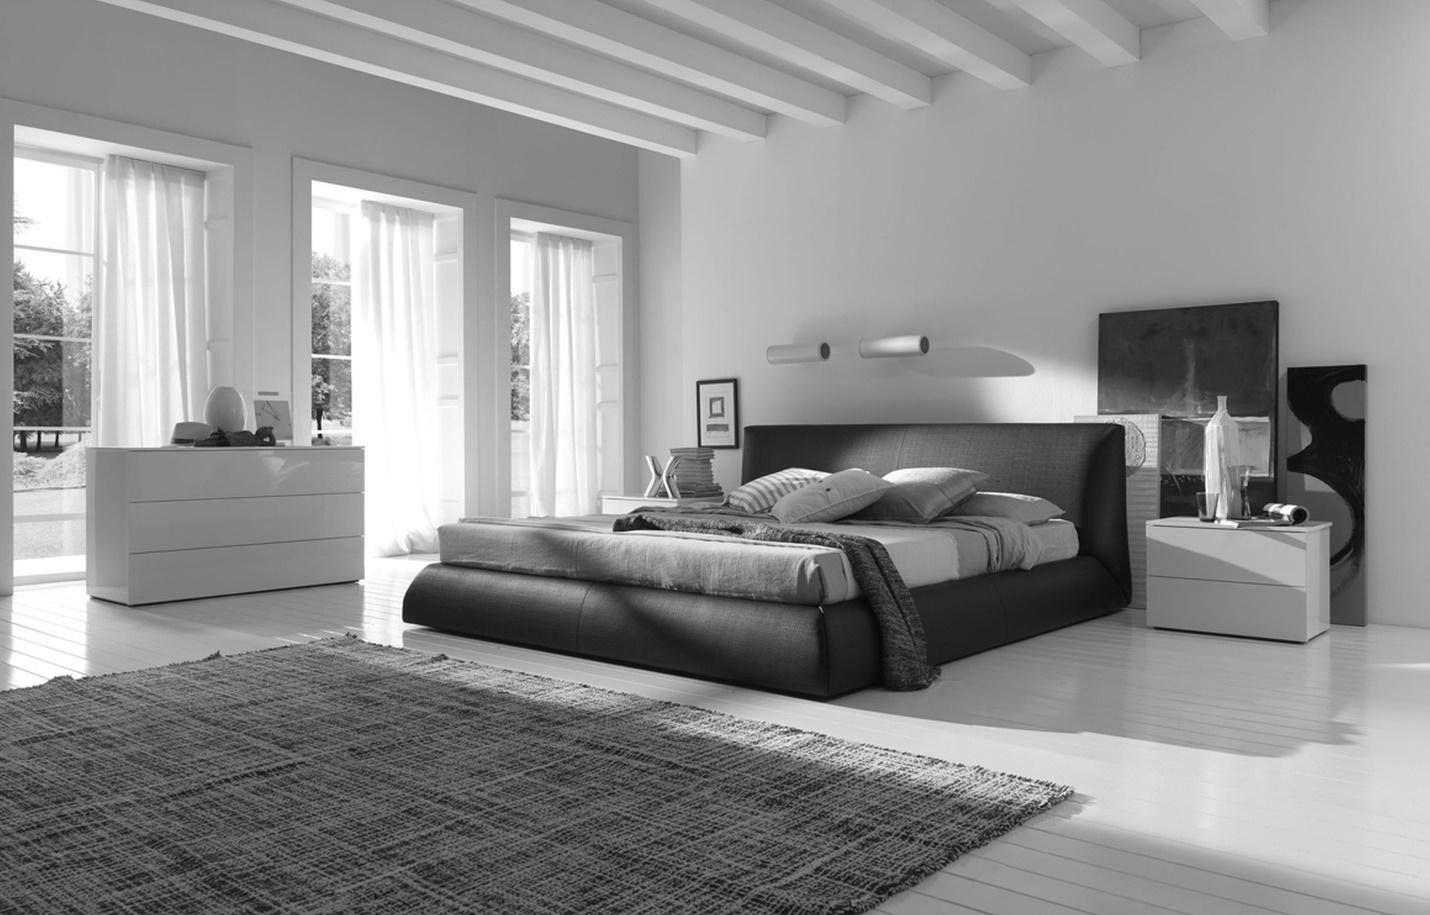 20 Contemporary Bedroom Furniture Ideas Contemporary Bedroom Furniture Bedroom Furniture Design Bedroom Interior